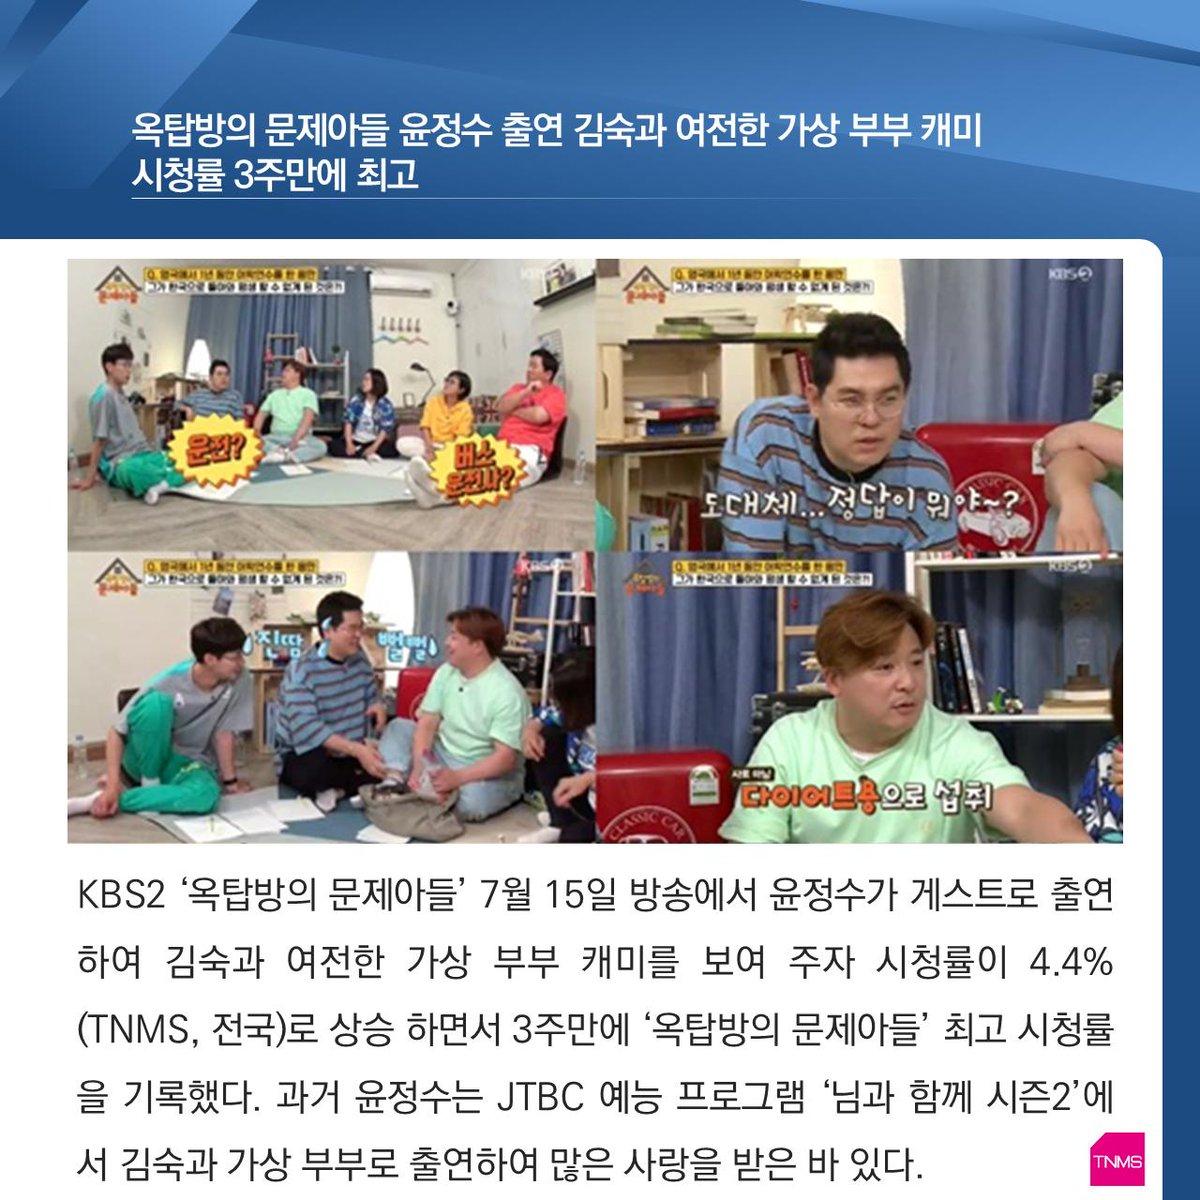 #KBS2 #옥탑방의문제아들 #윤정수 출연 #김숙 여전한 가상 부부 케미 #시청률 3주만에 최고